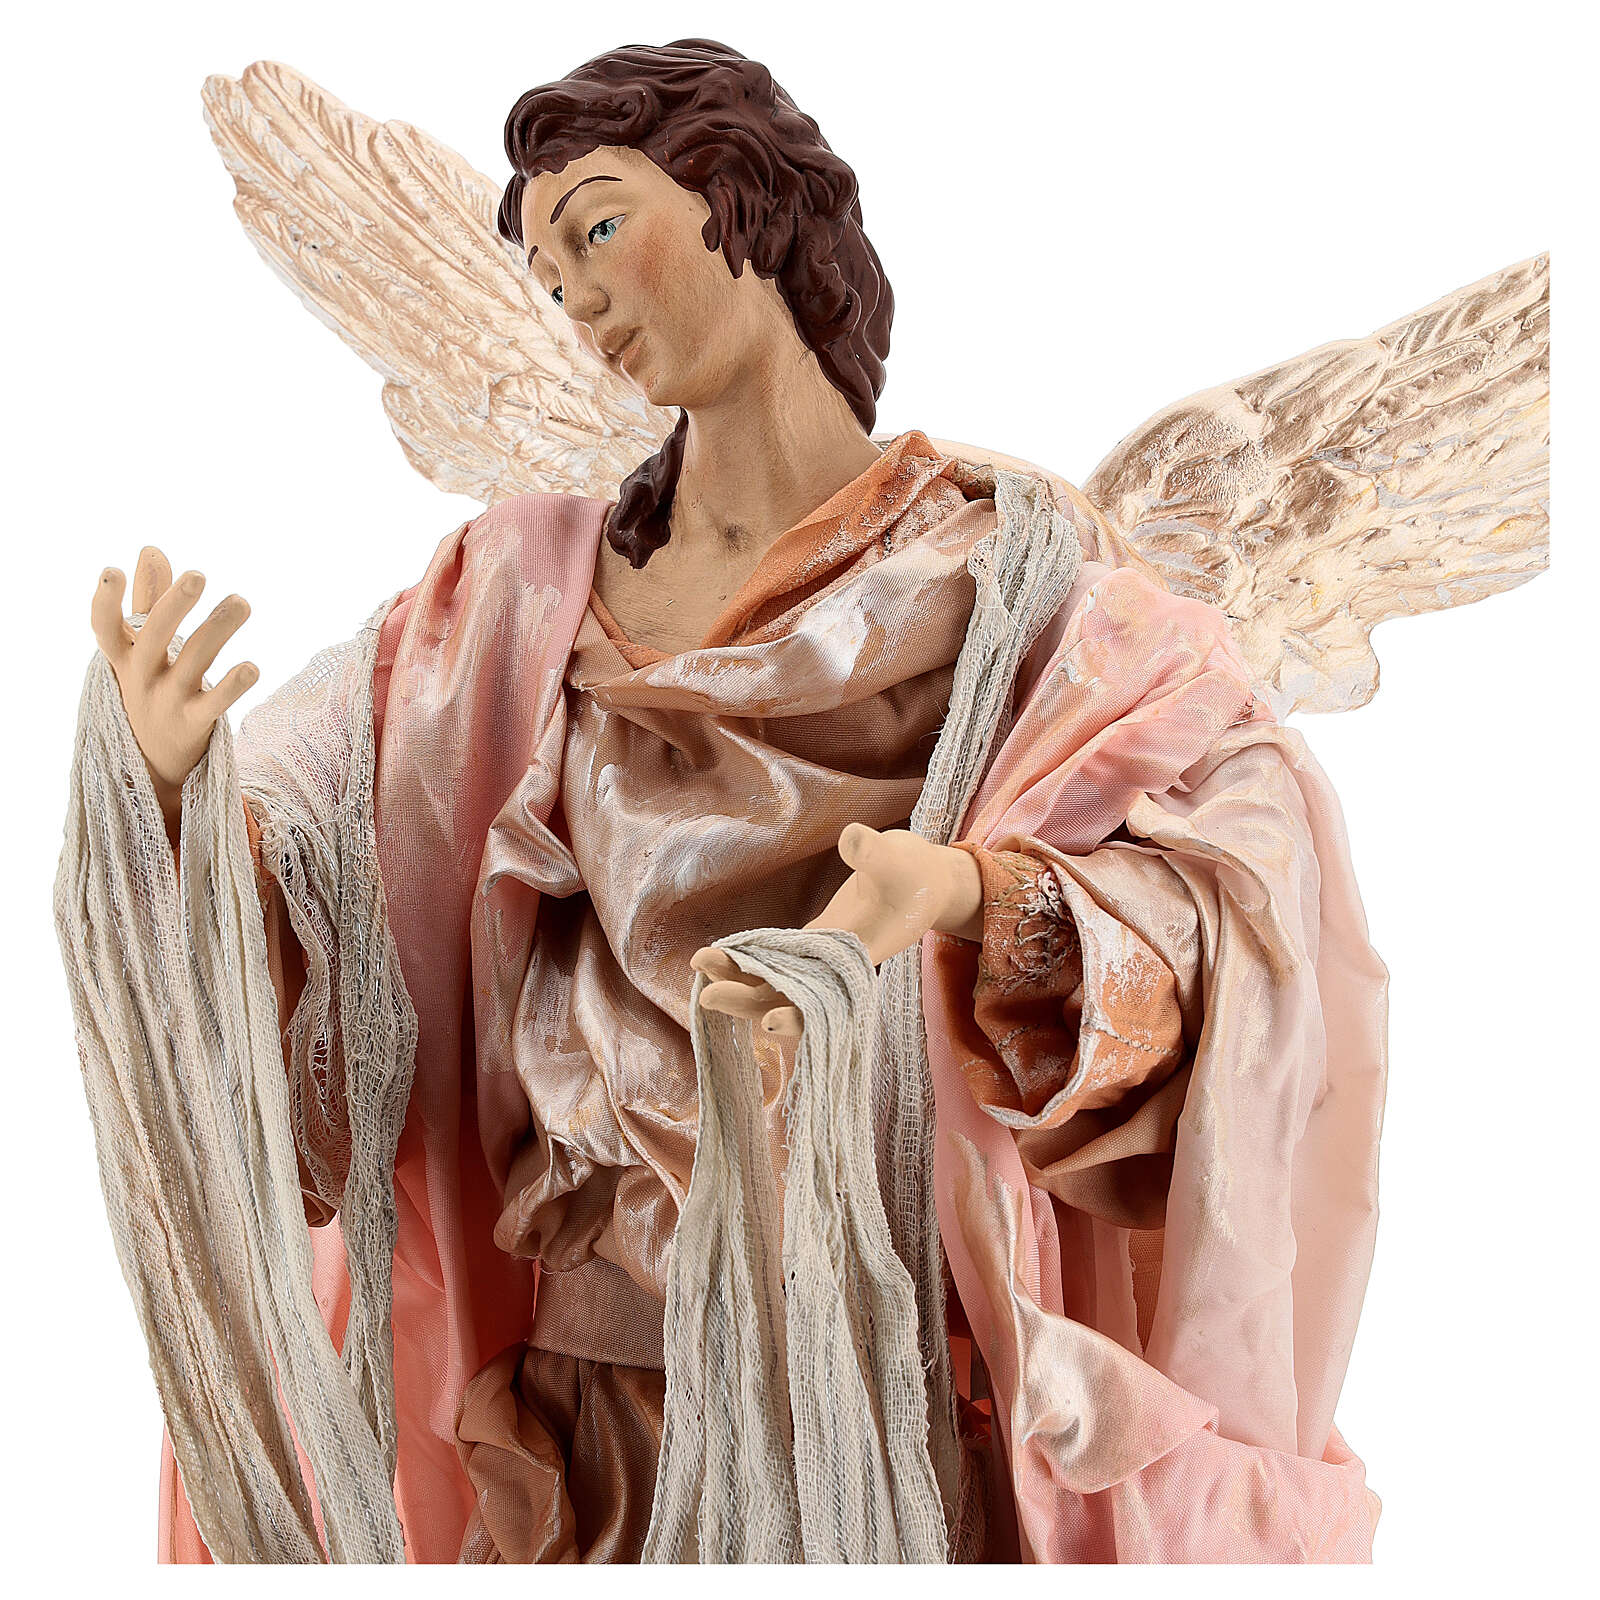 Ángel moreno pedestal madera terracota 45 cm belén napolitano 4